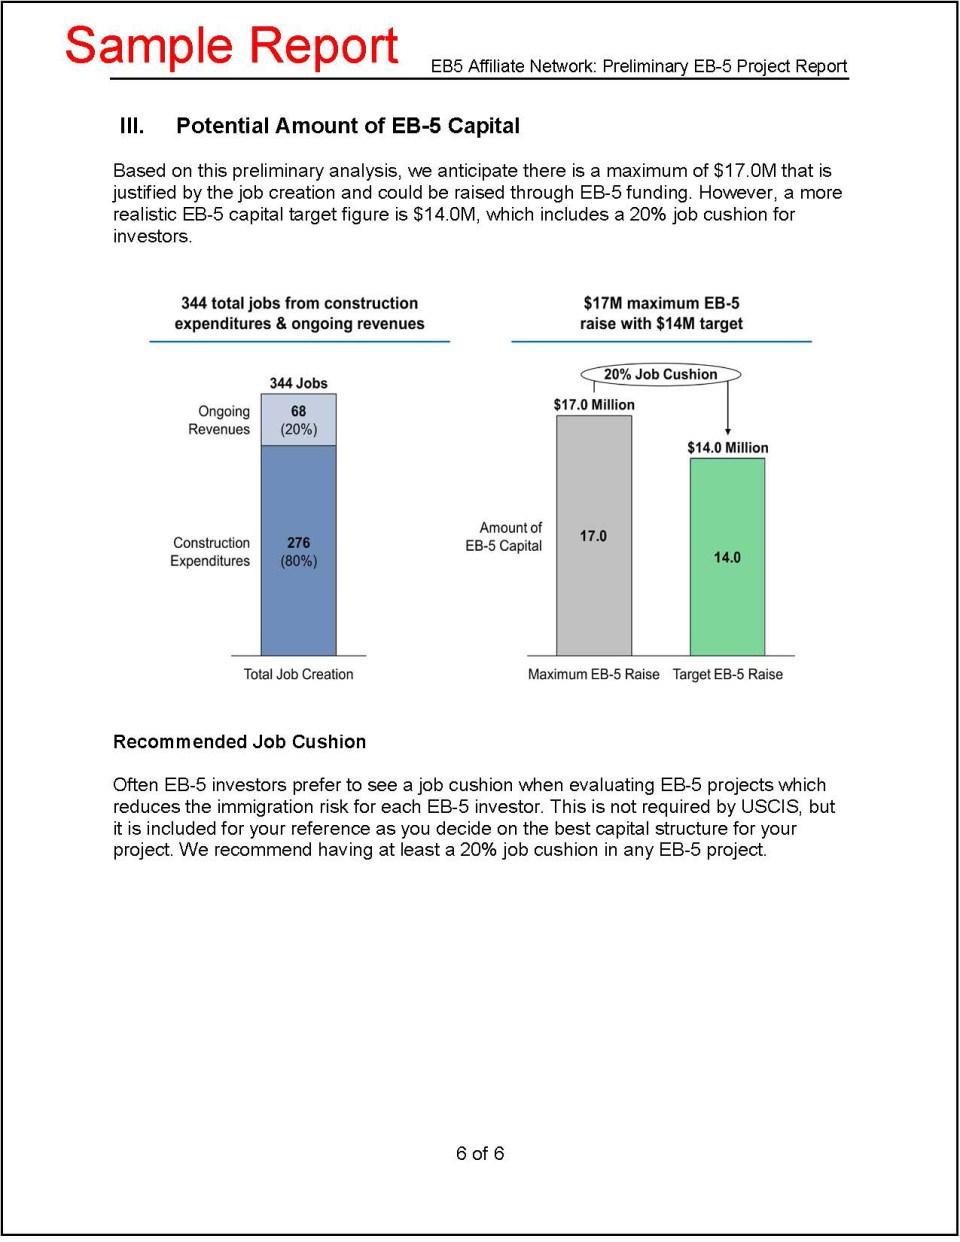 Sample Preliminary Job Report (V7) Final (BLACK) 3.23.2016 RED BORDER_Page_6